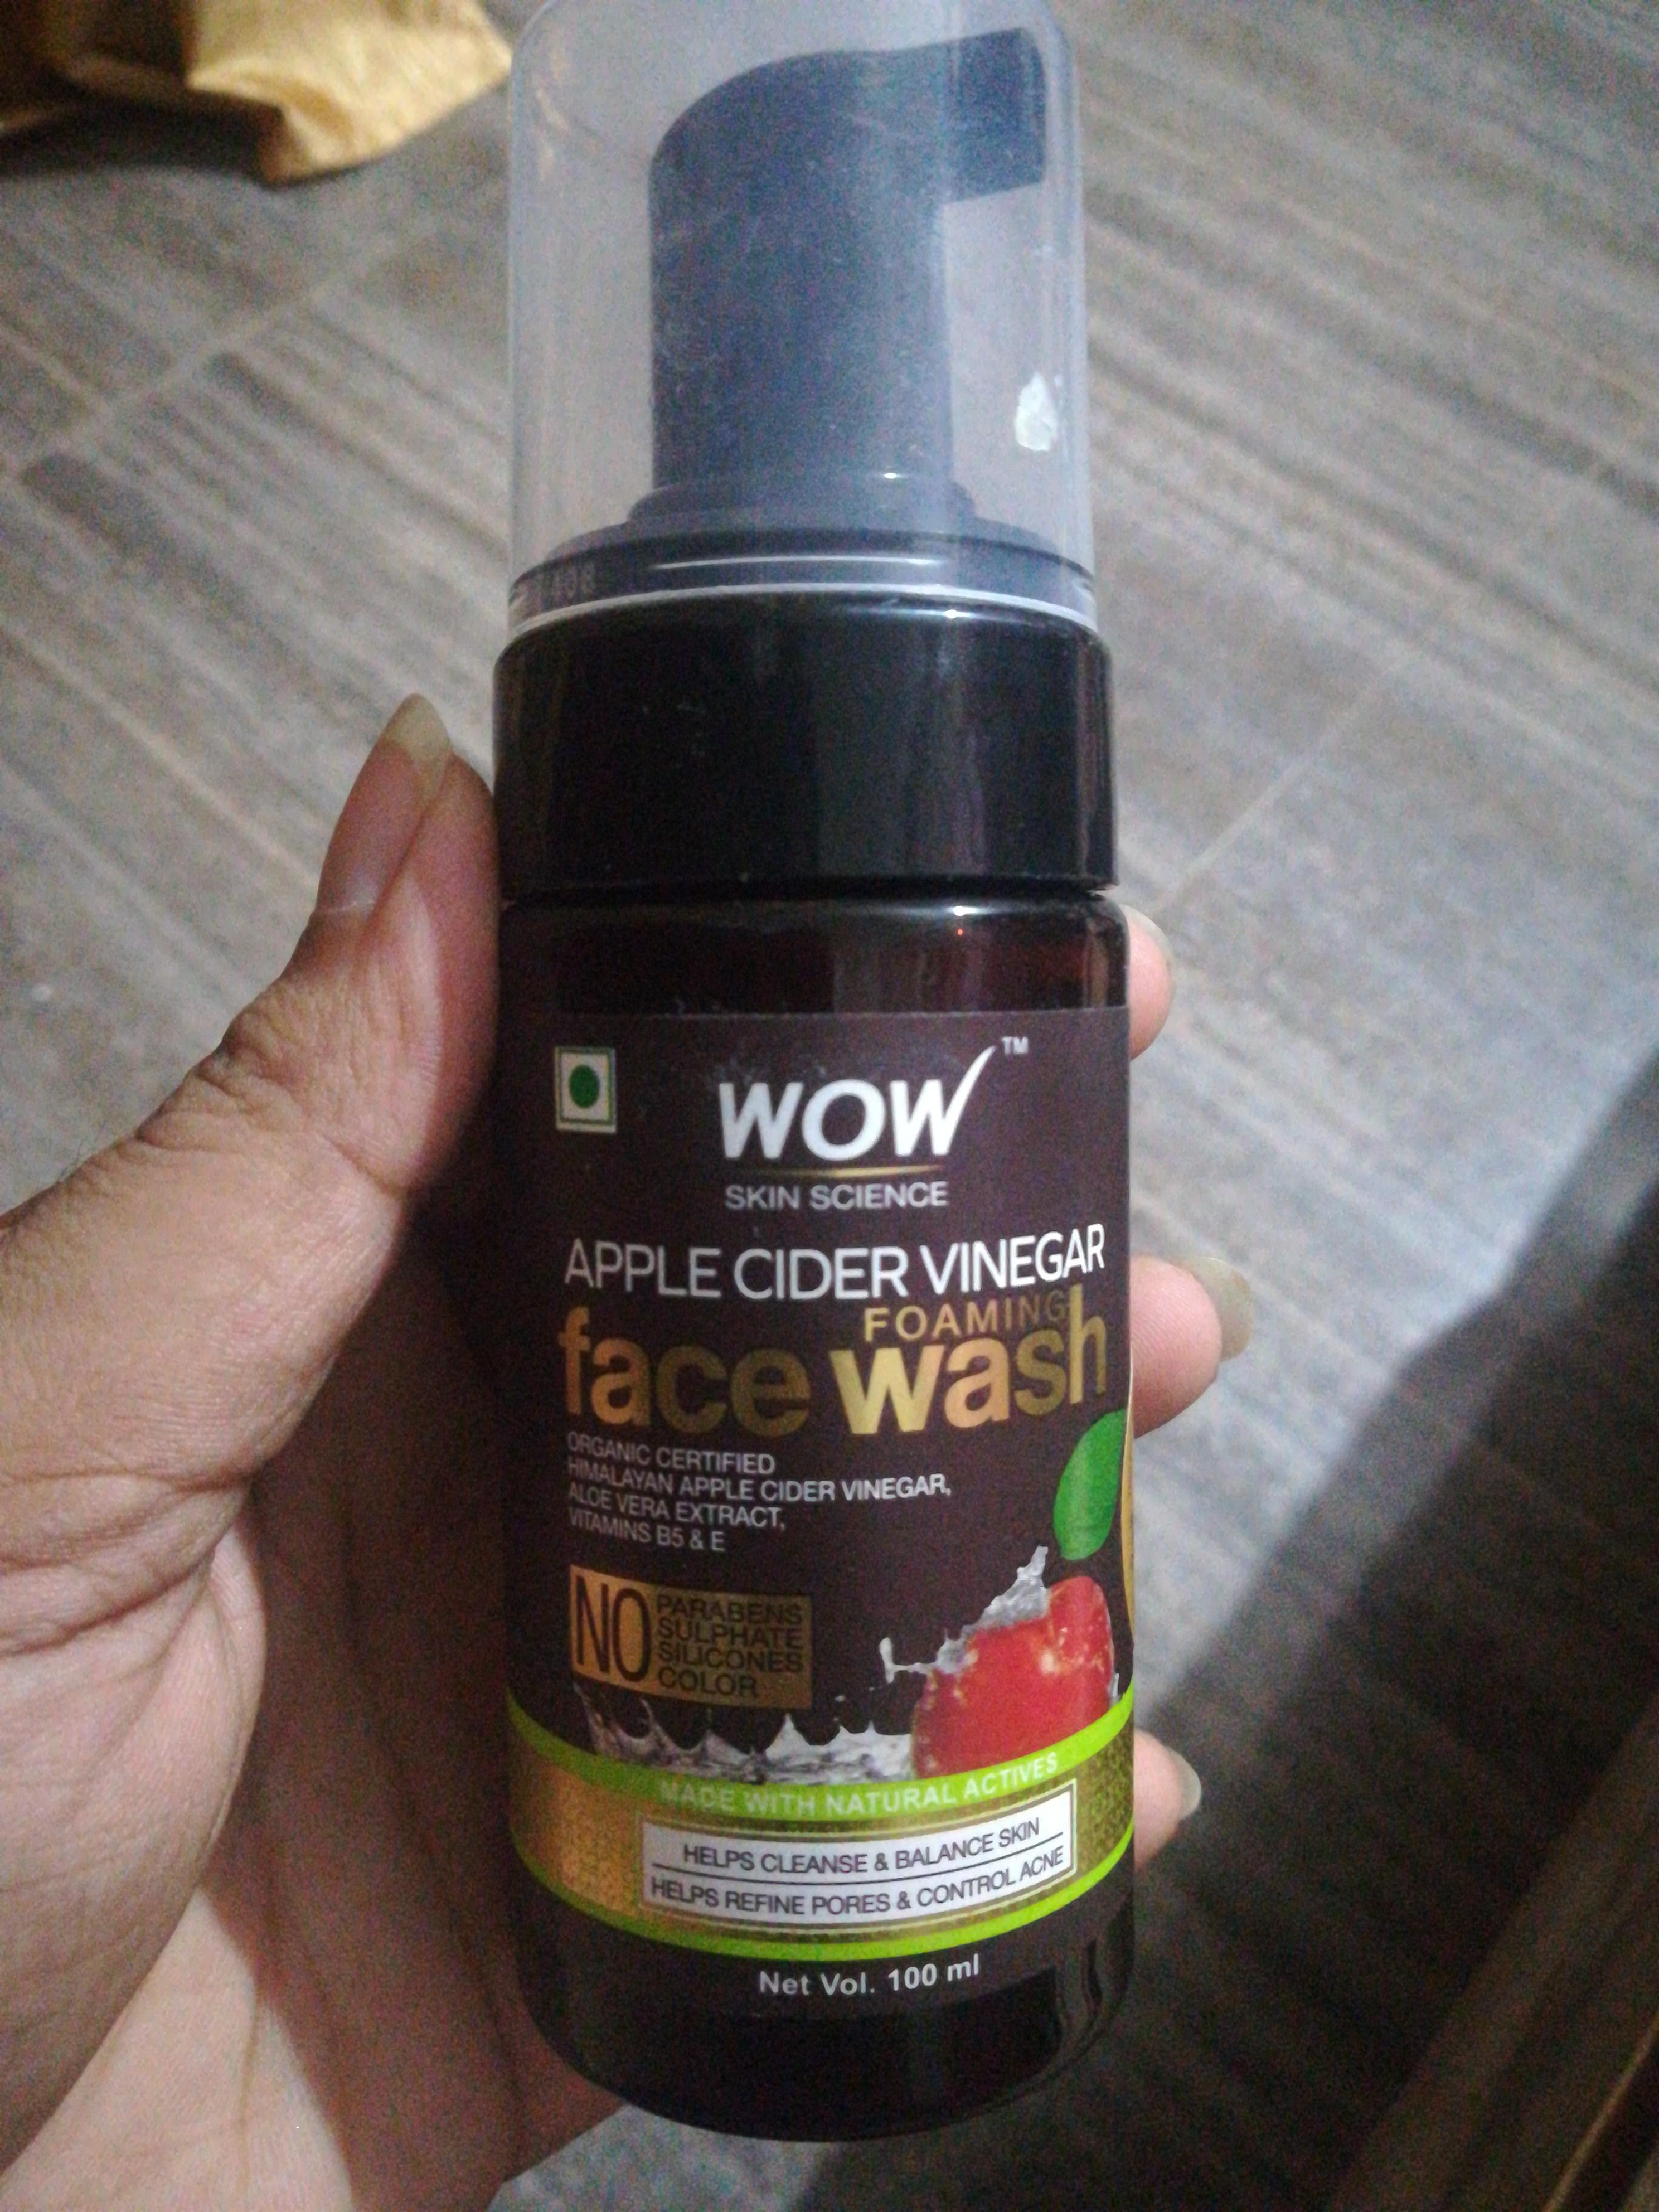 WOW Skin Science Apple Cider Vinegar Foaming Face Wash-Best cleanser-By vaishnavi11